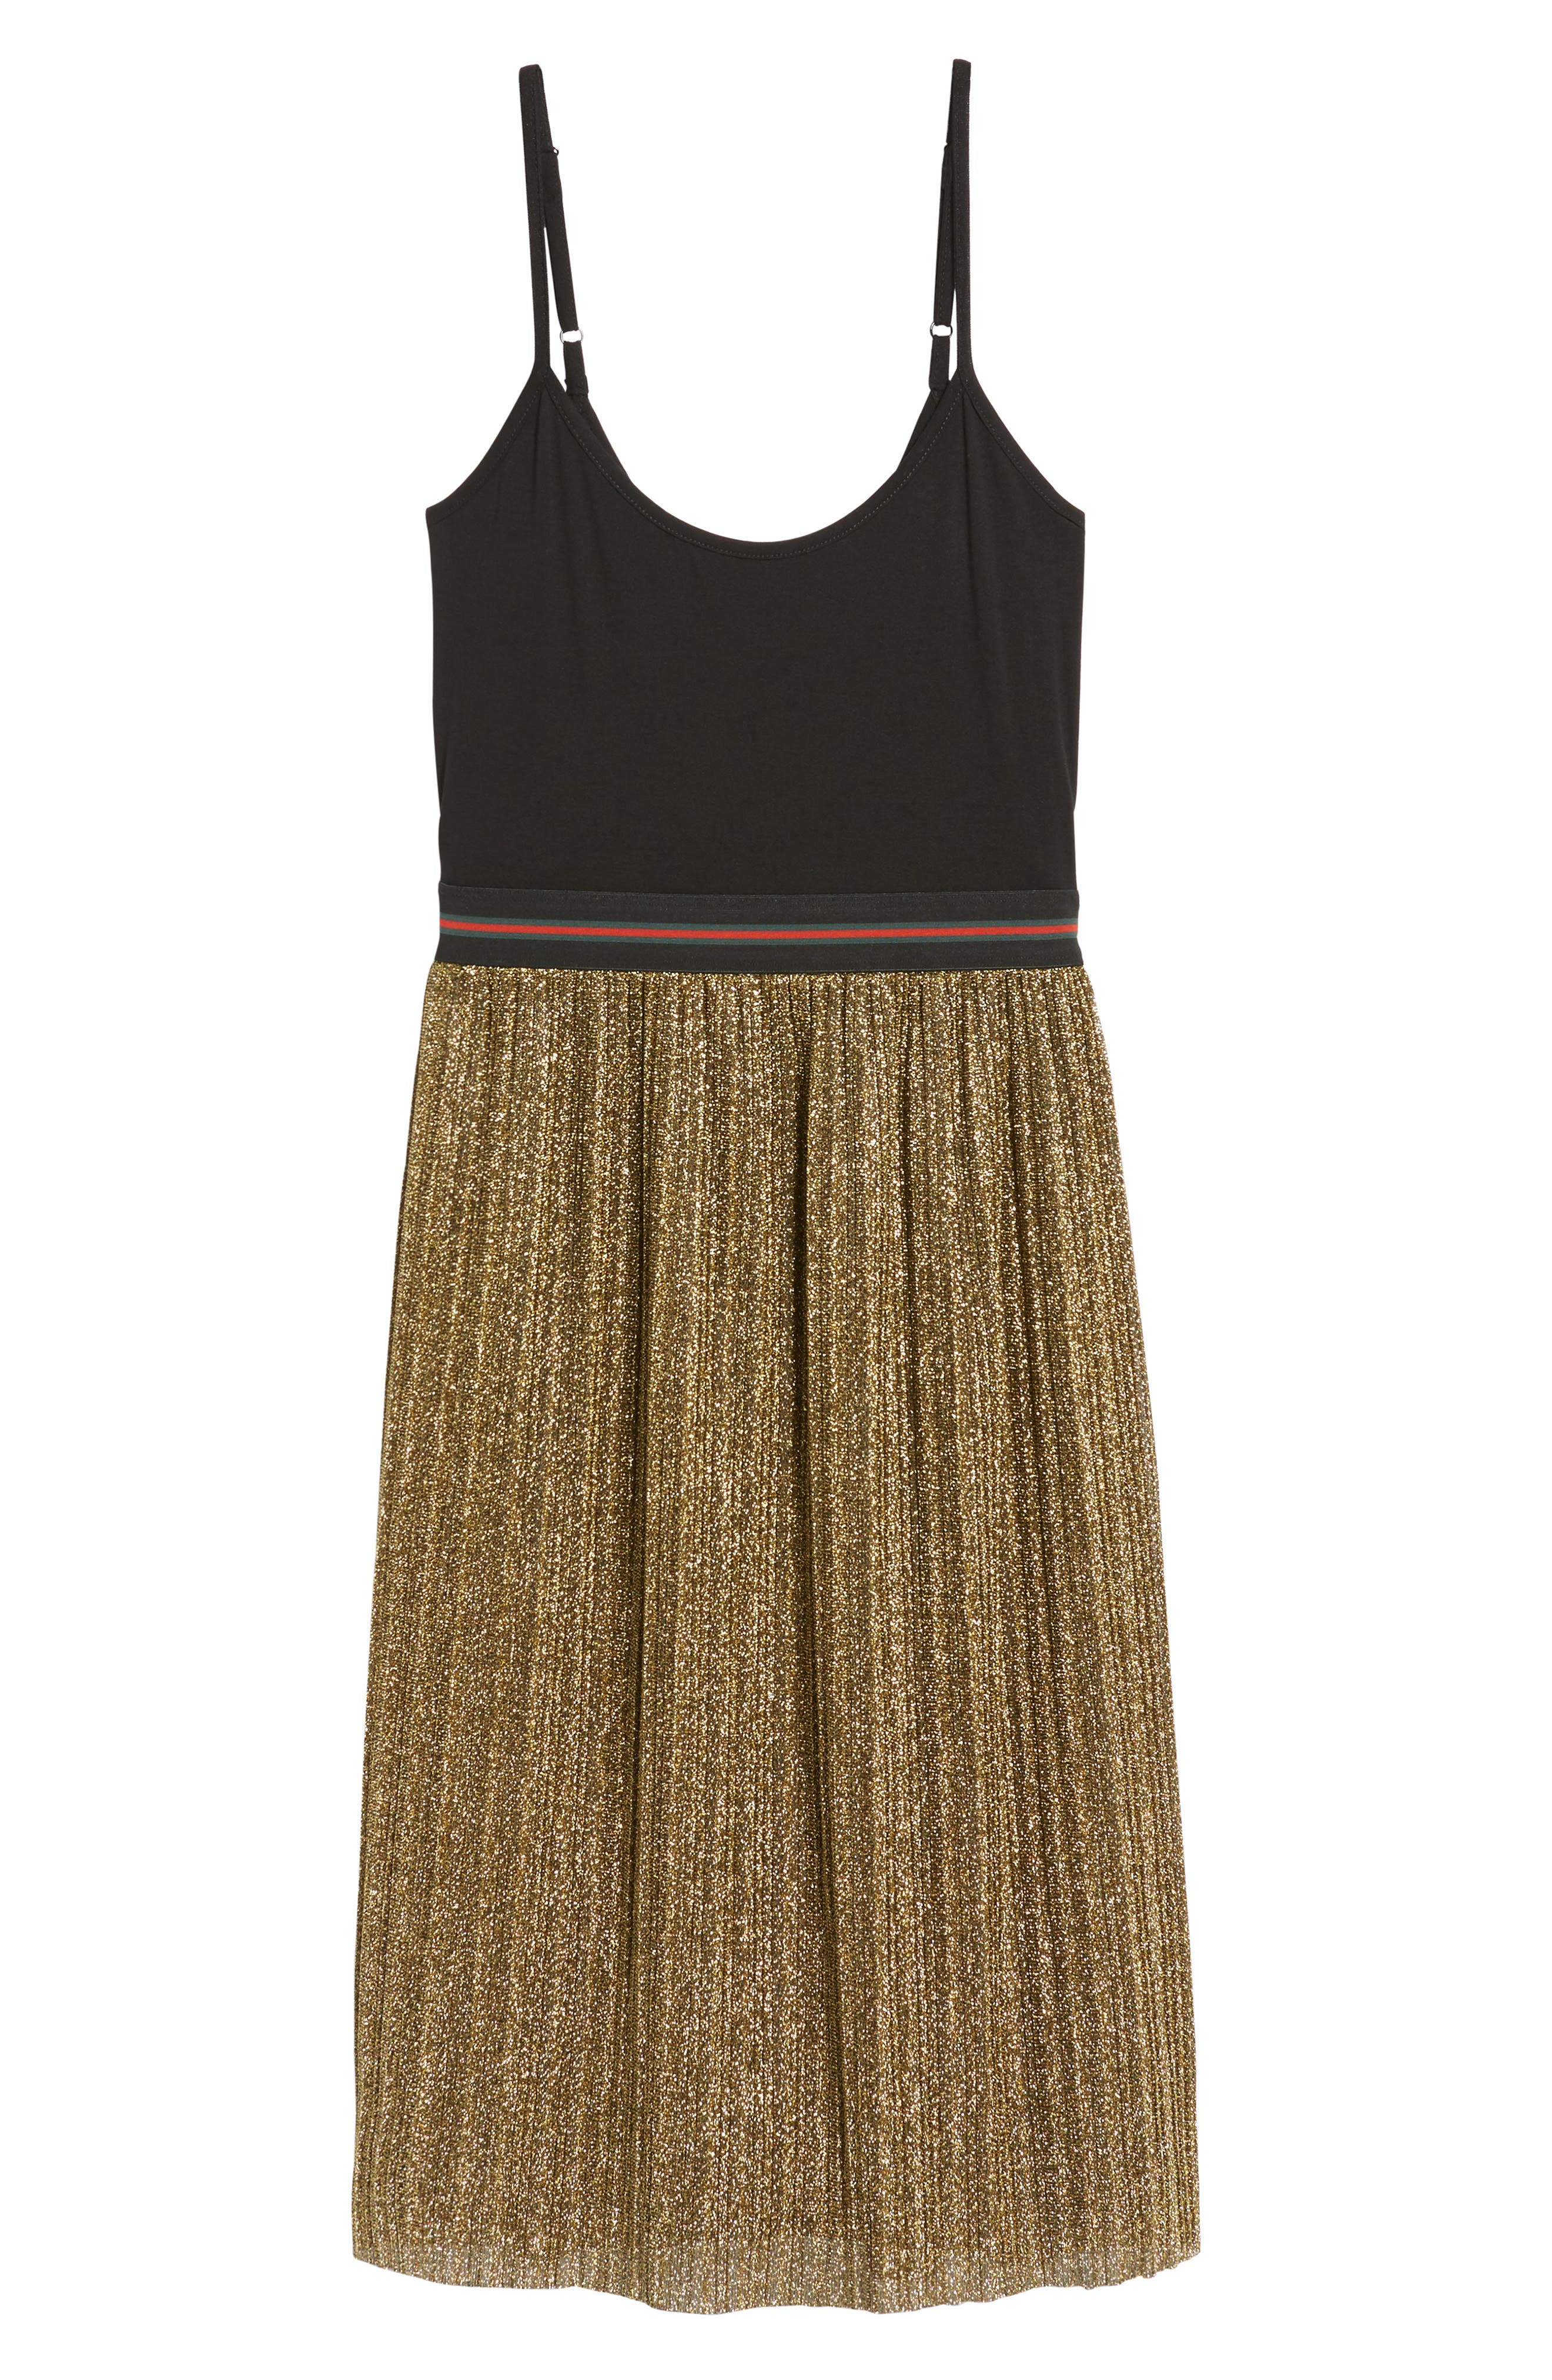 Metallic Tank Dress,                             Alternate thumbnail 6, color,                             002